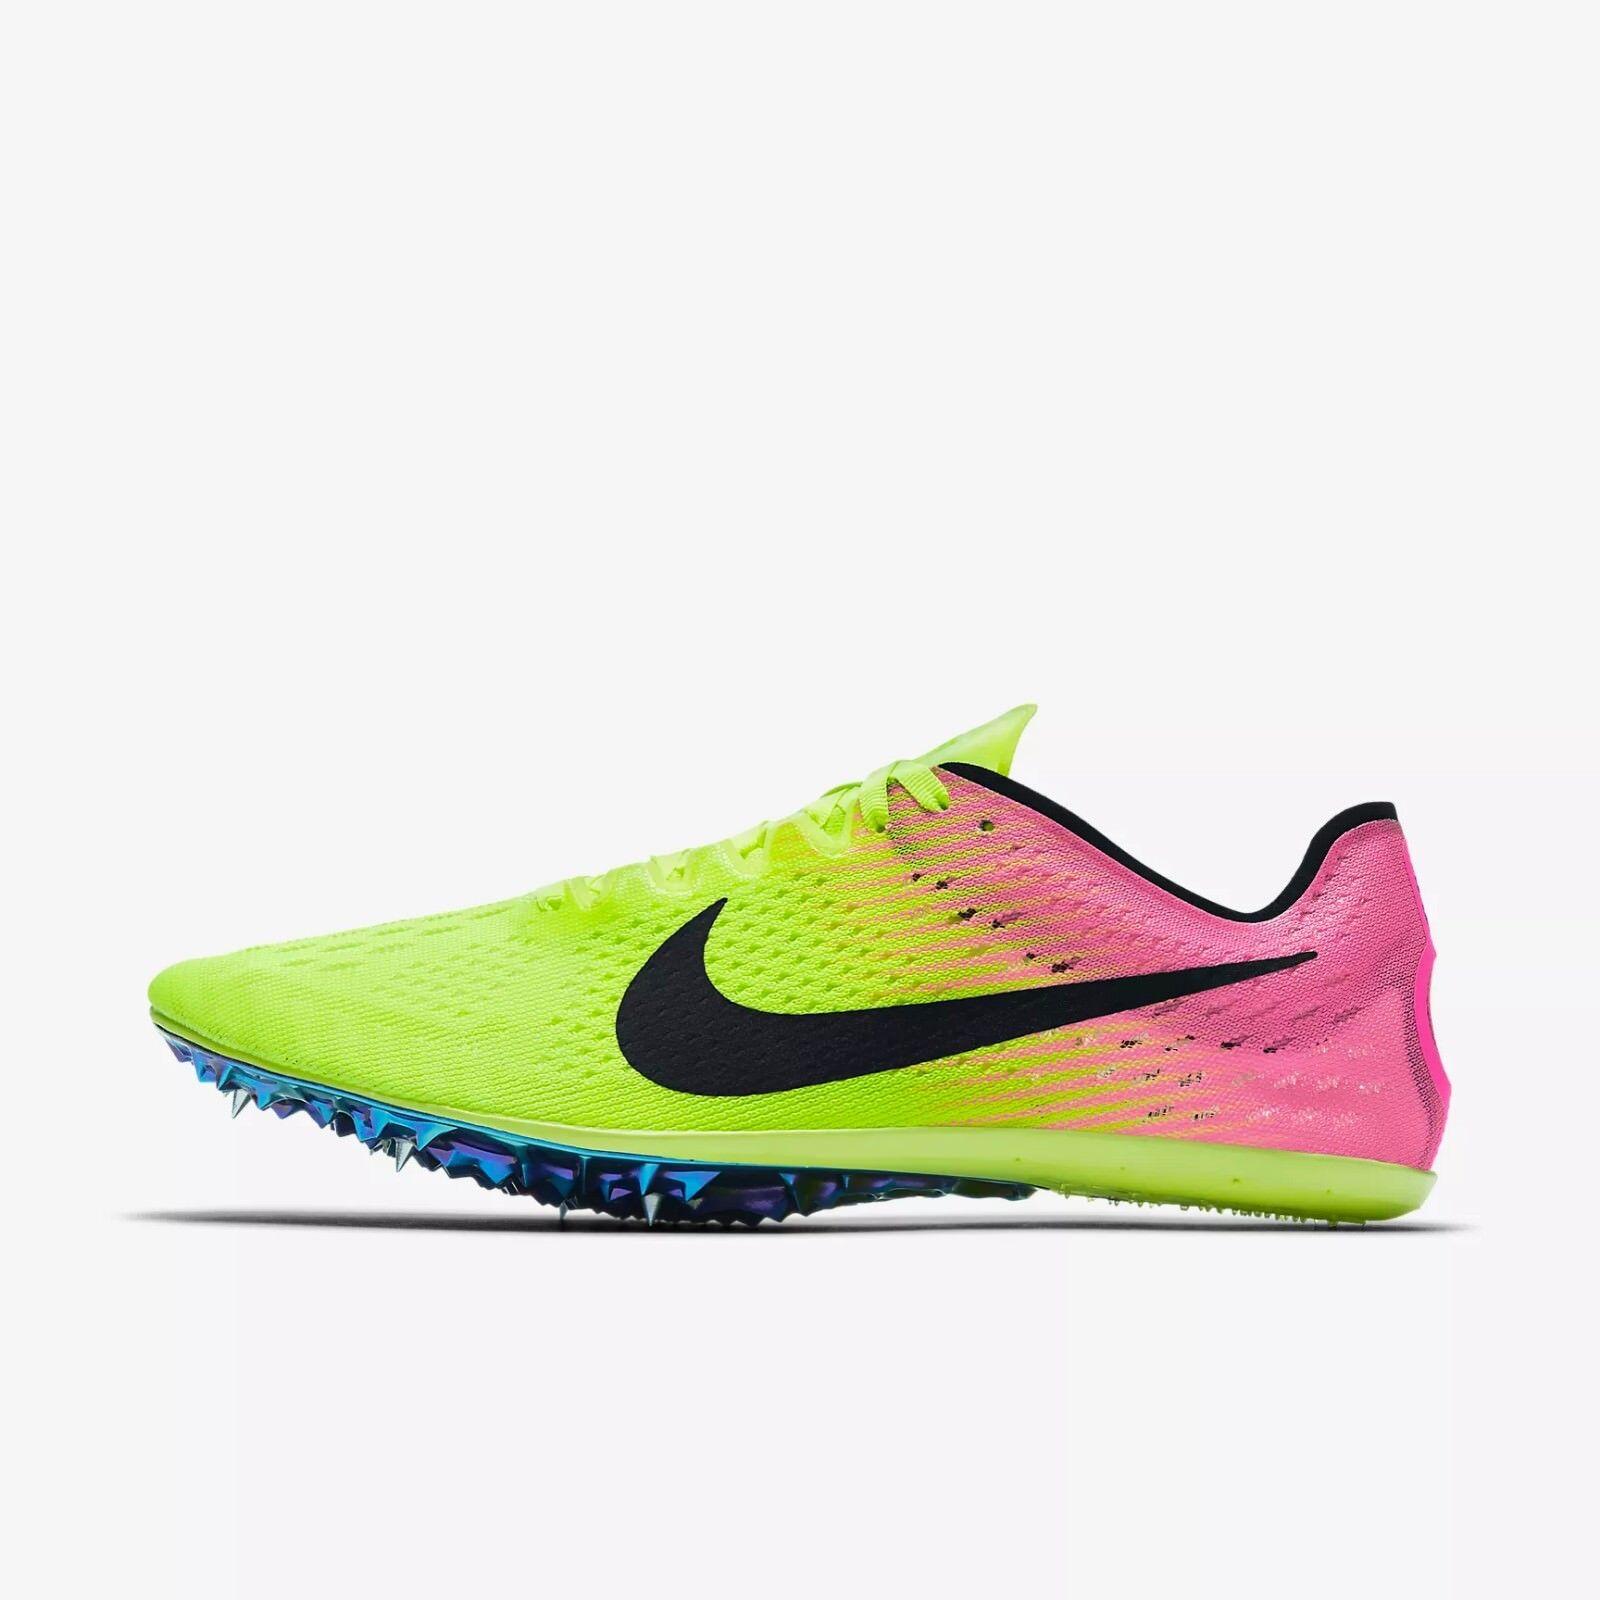 Nike Zoom Victory Elite 2 OC Track Field Spikes - Volt Pink 835998-999 MSRP